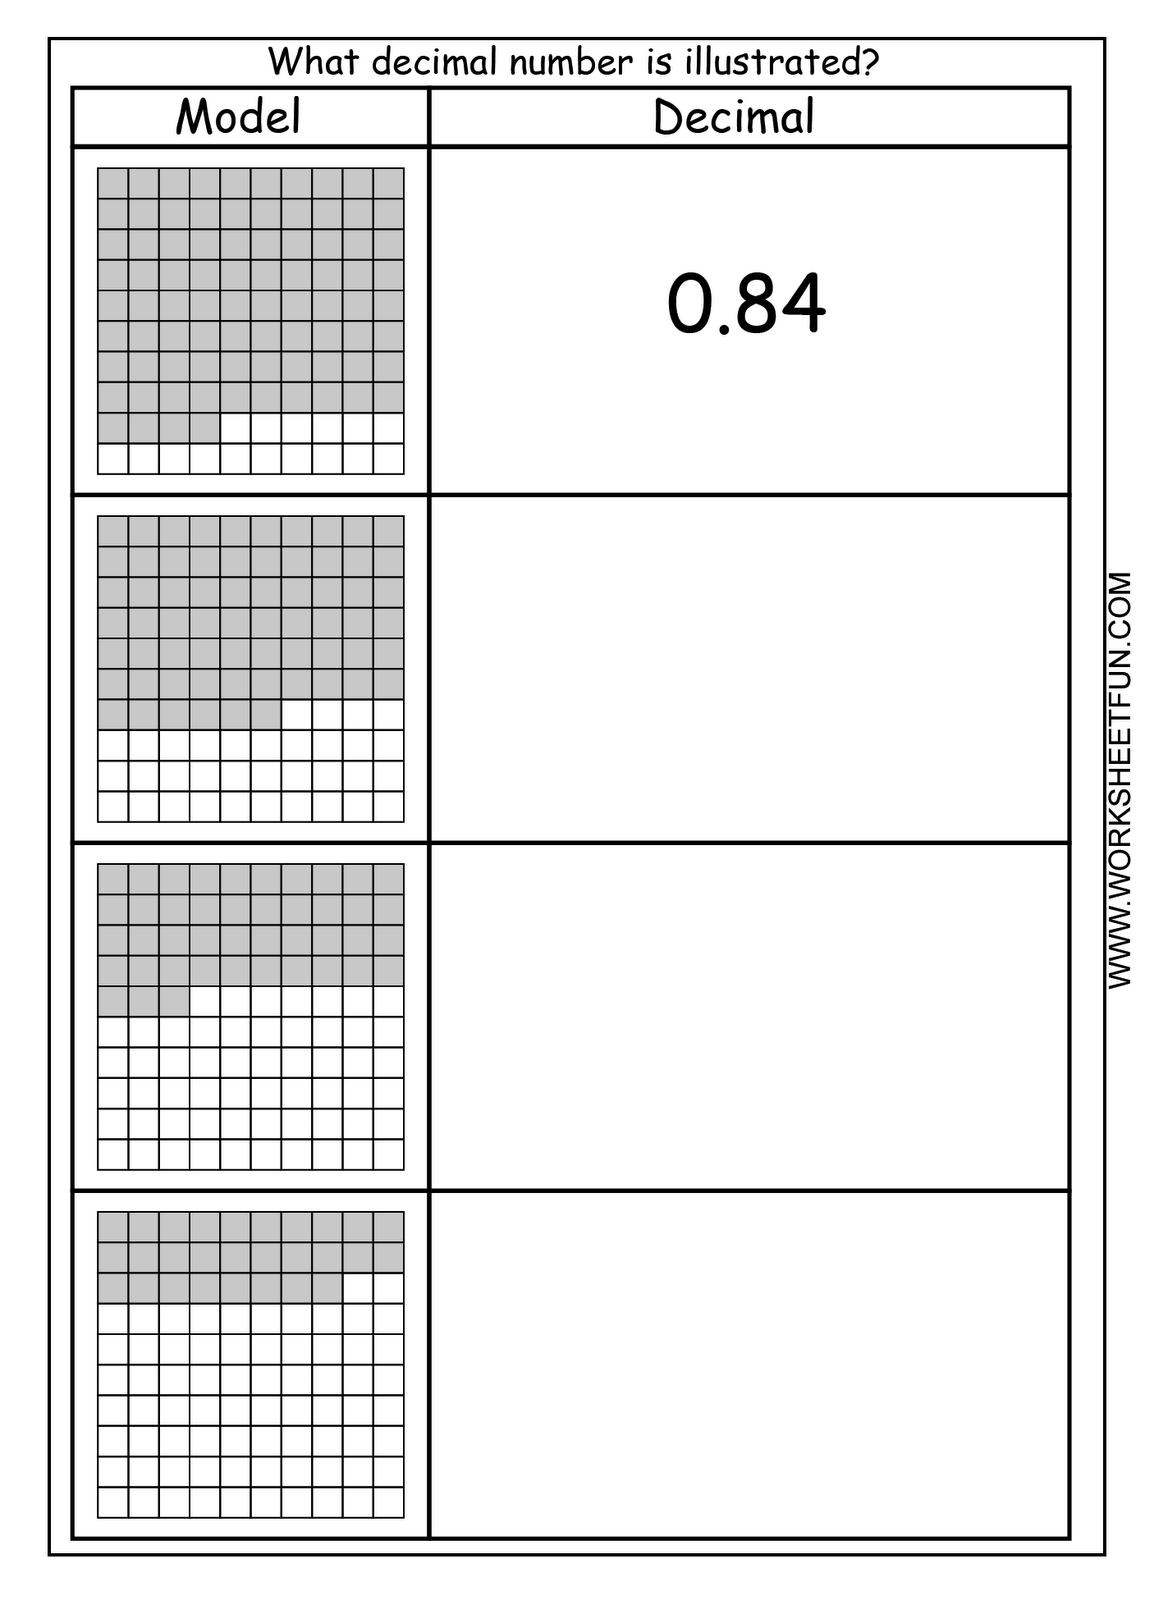 decimal worksheets fractions decimals math worksheets decimals worksheets fractions. Black Bedroom Furniture Sets. Home Design Ideas